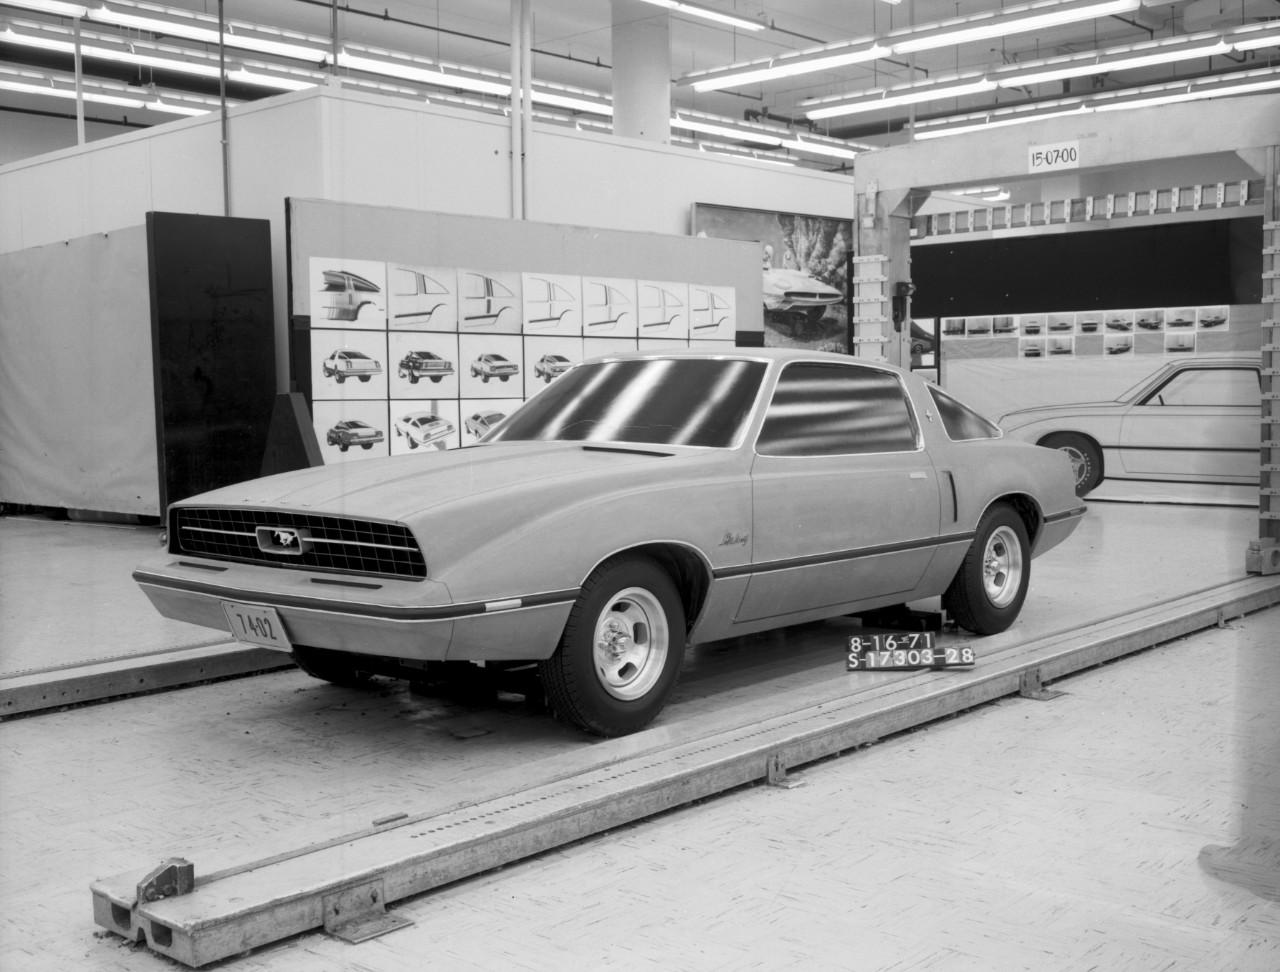 Shark-nose Ghia Mustang II